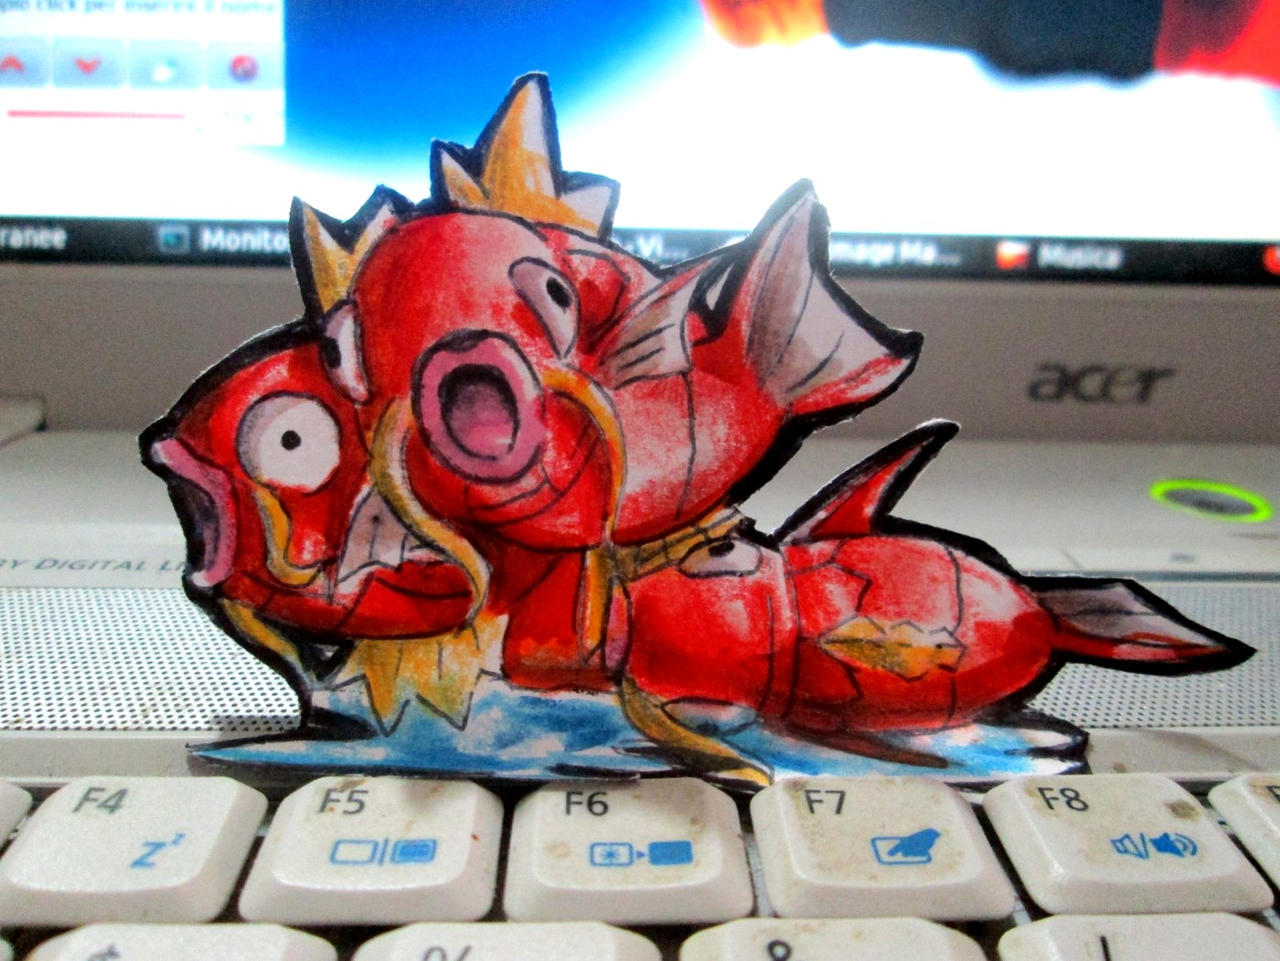 Paperchild 205.Pokemon#132 - Ditto by FuriarossaAndMimma on DeviantArt